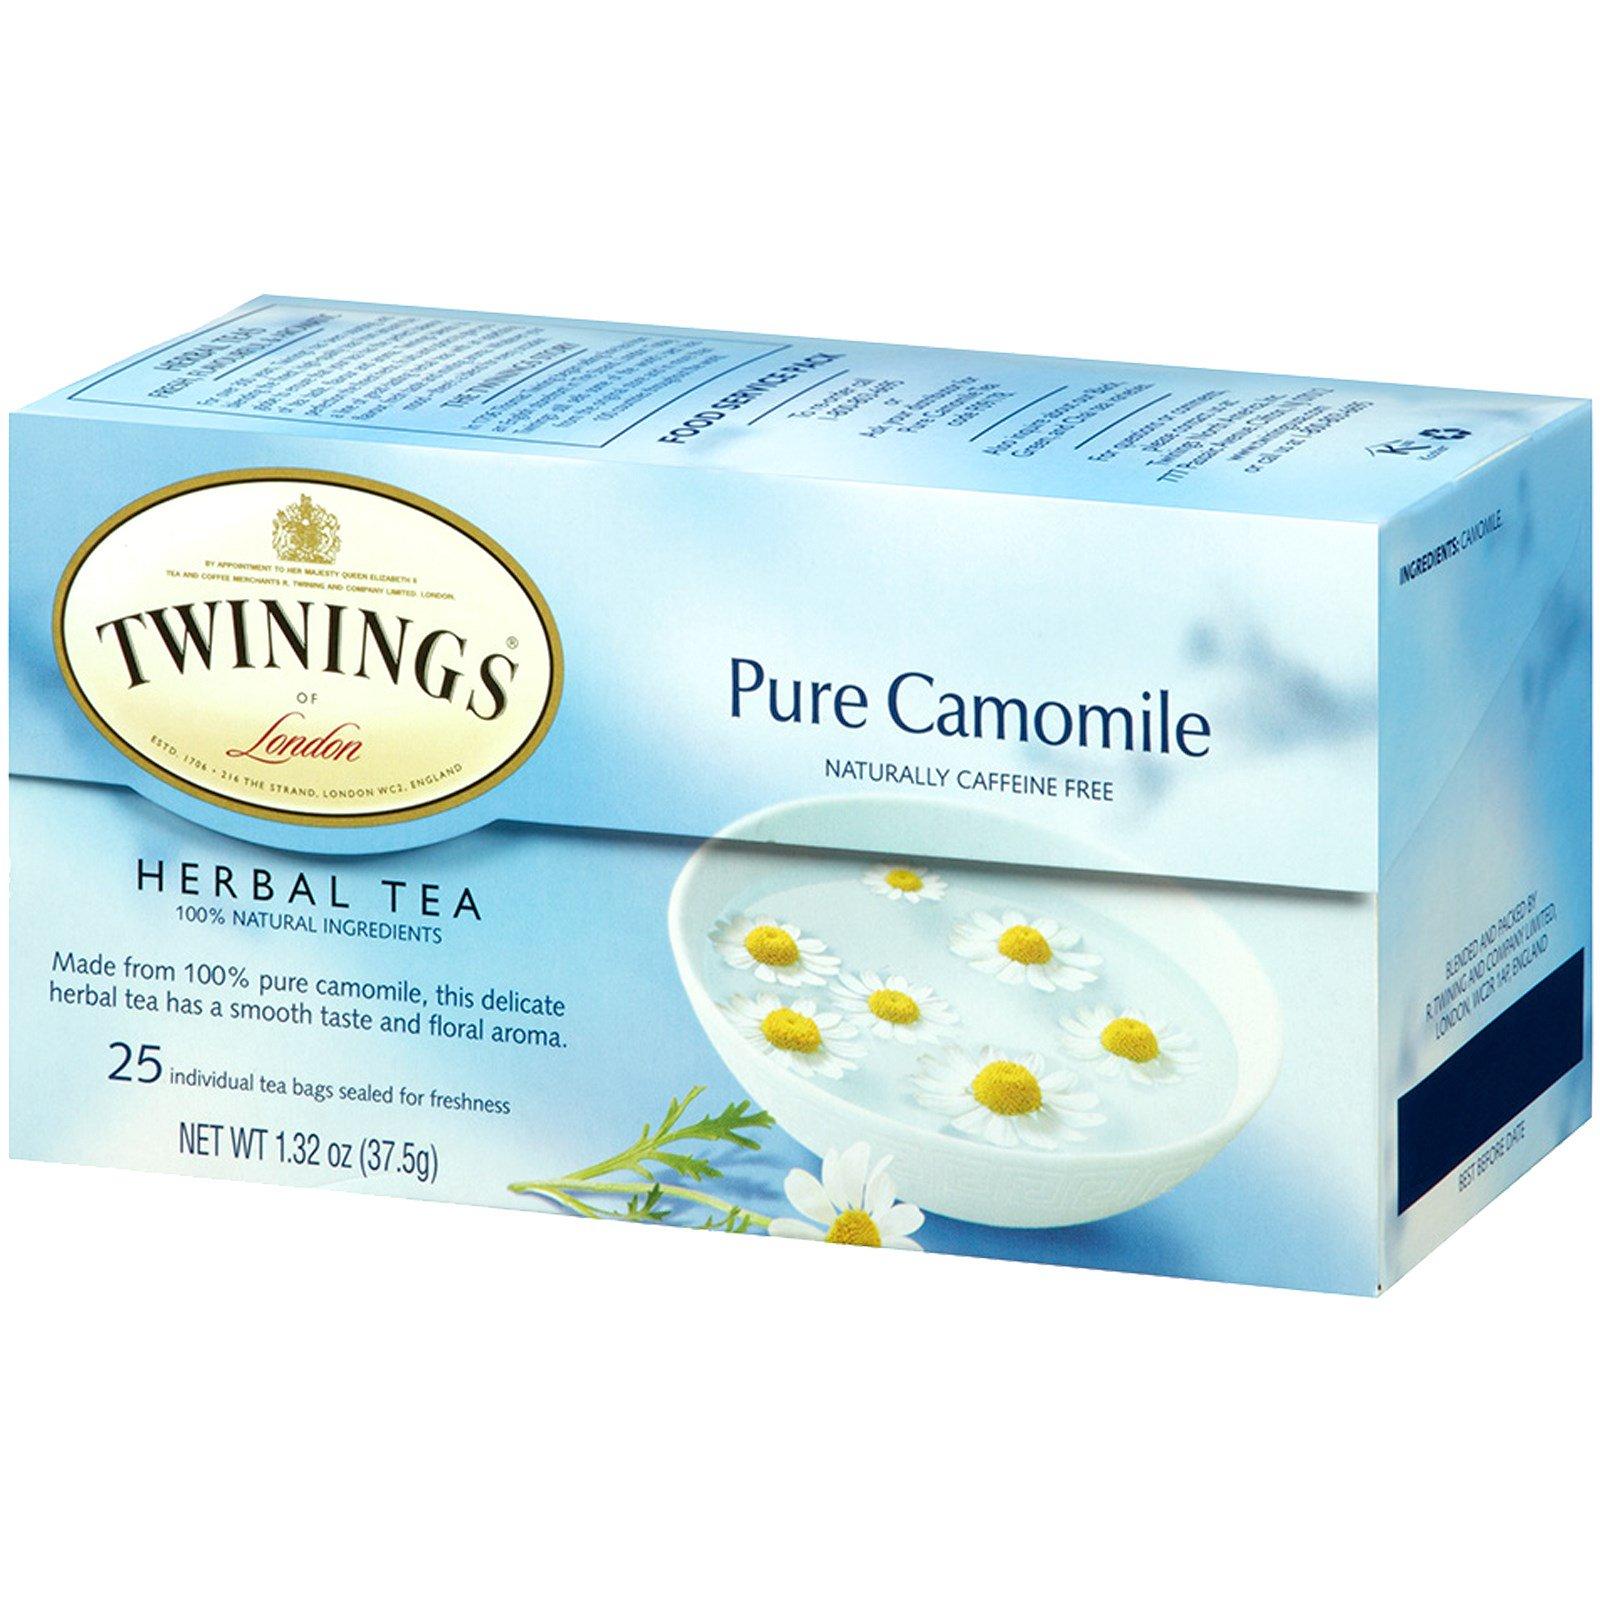 Twinings Herbal Tea Pure Camomile Caffeine Free 25 Bags 1 32